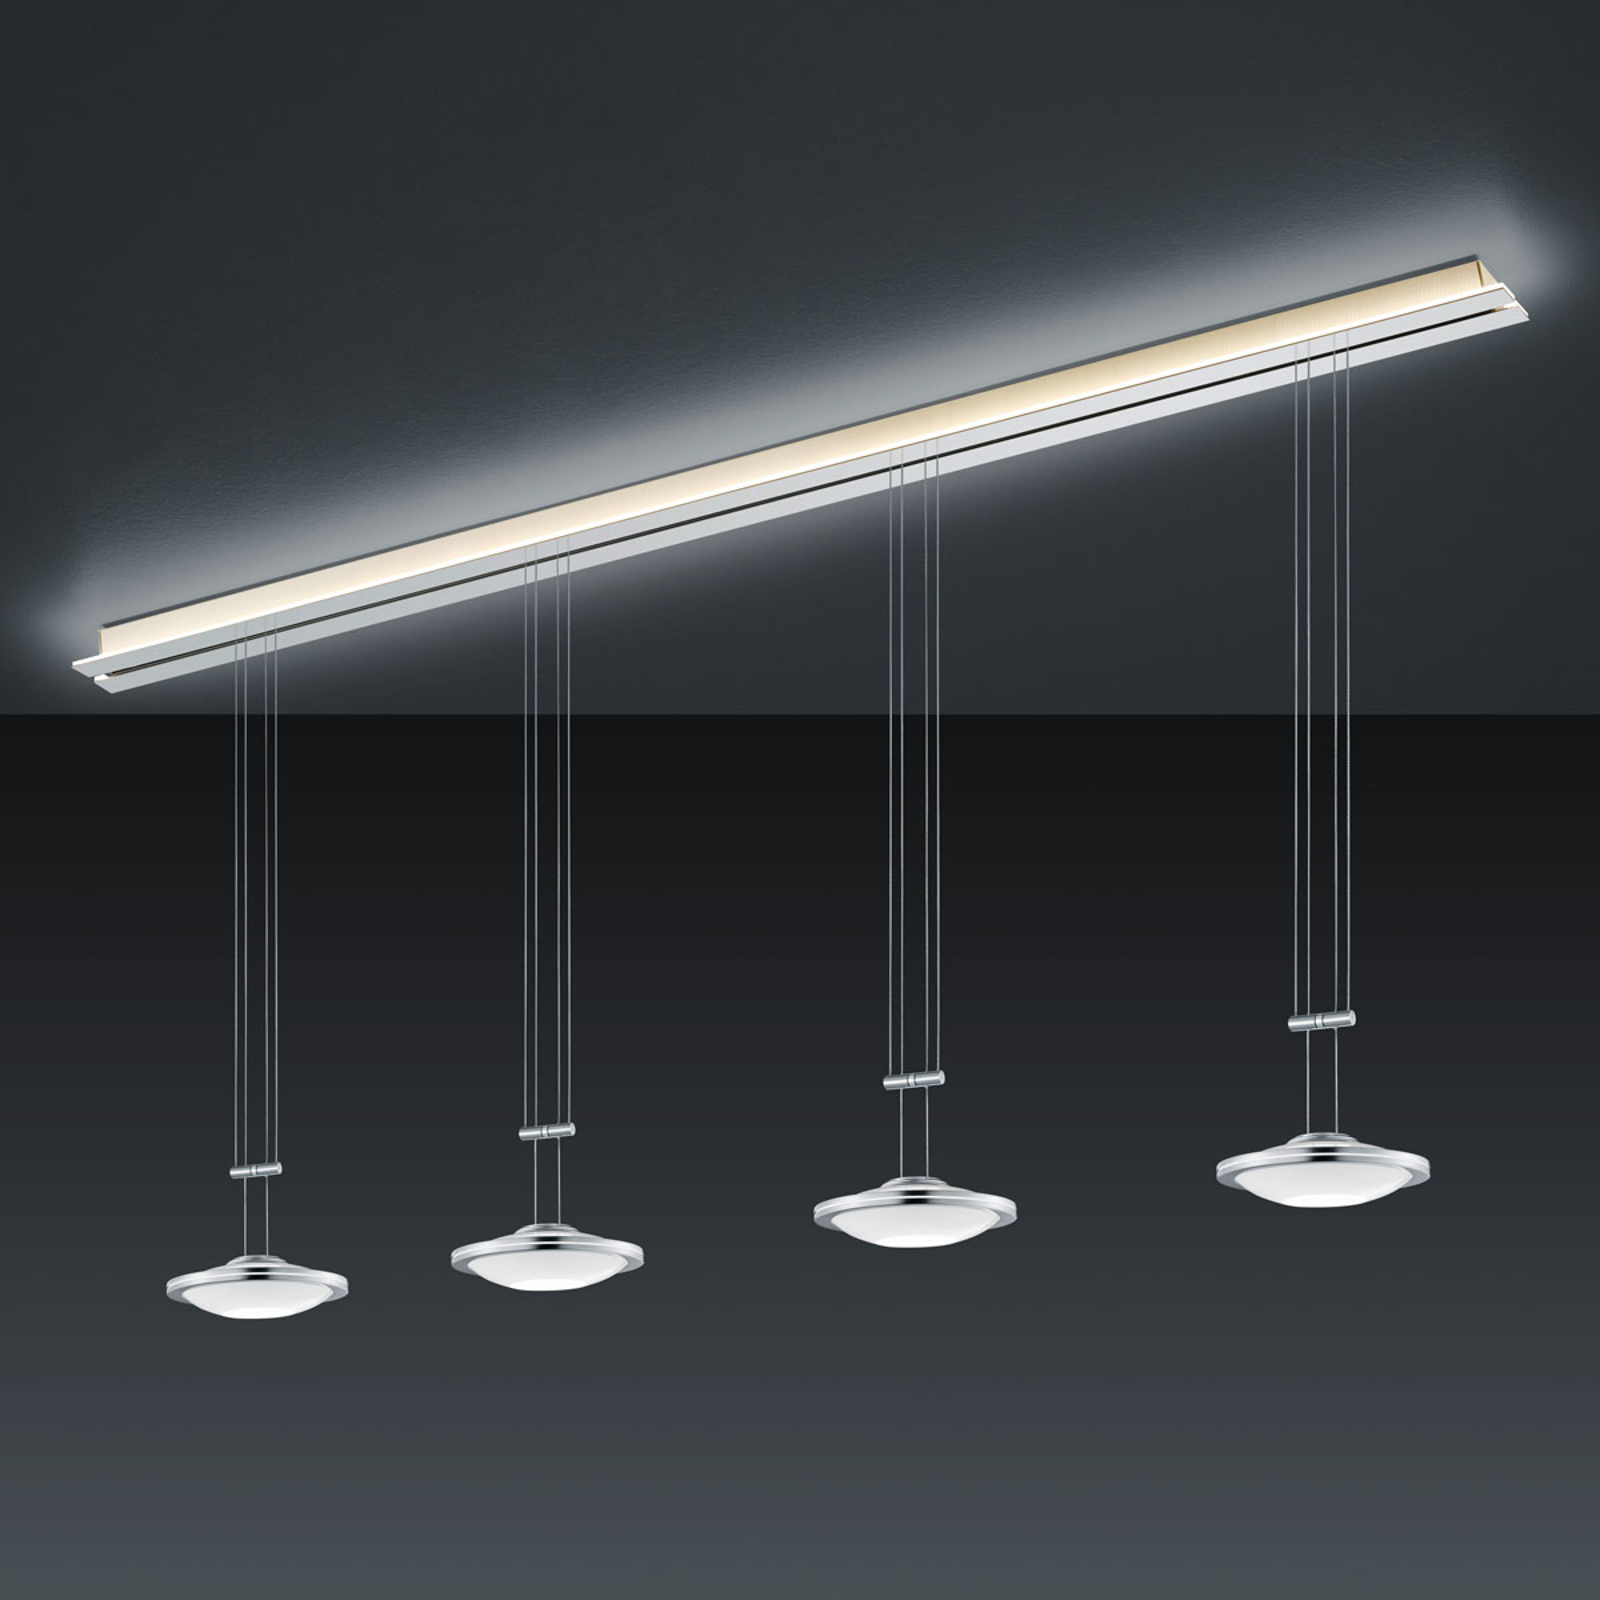 BANKAMP Strada Saturno lampa wisząca, 4pkt, 185 cm